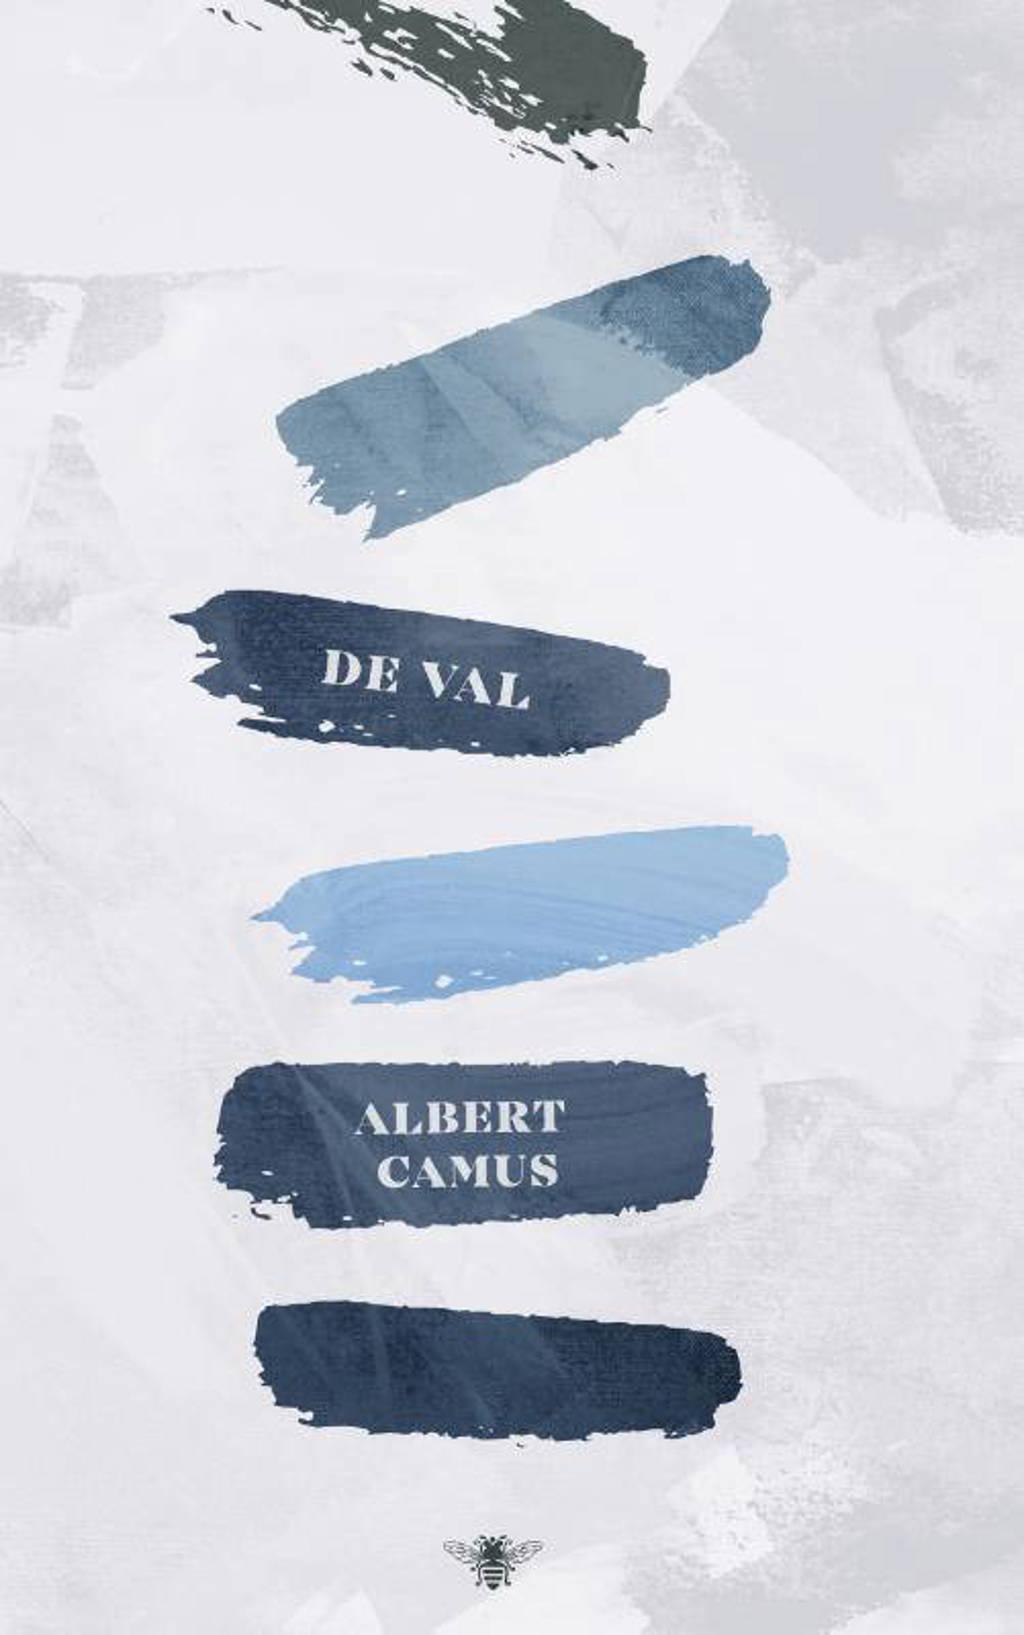 De val - Albert Camus